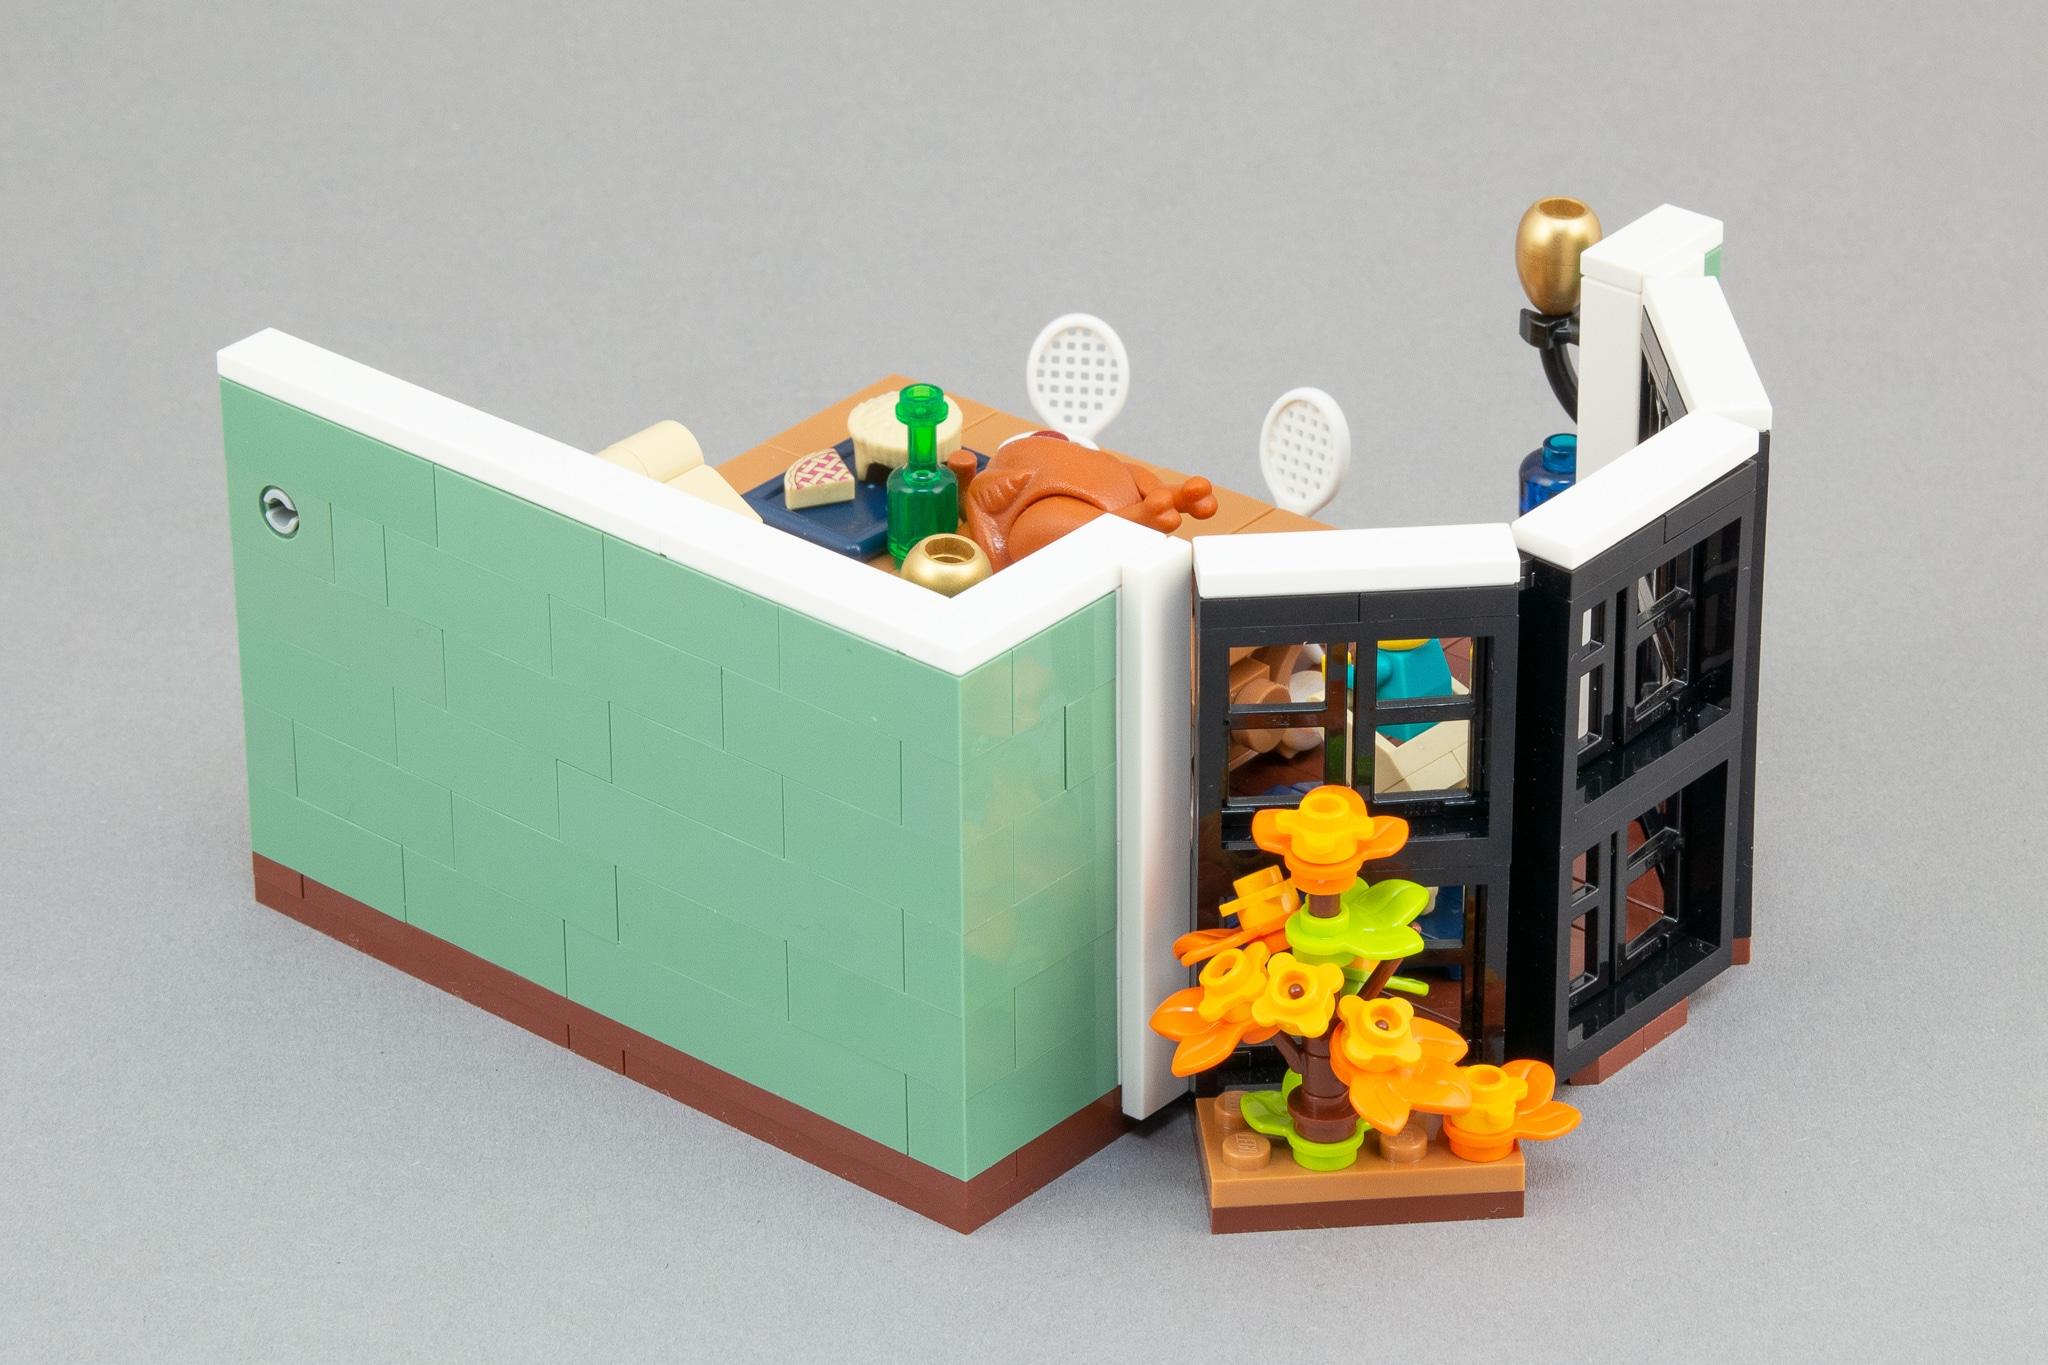 LEGO Moc Bausinpiration Esszimmer Rueckseite